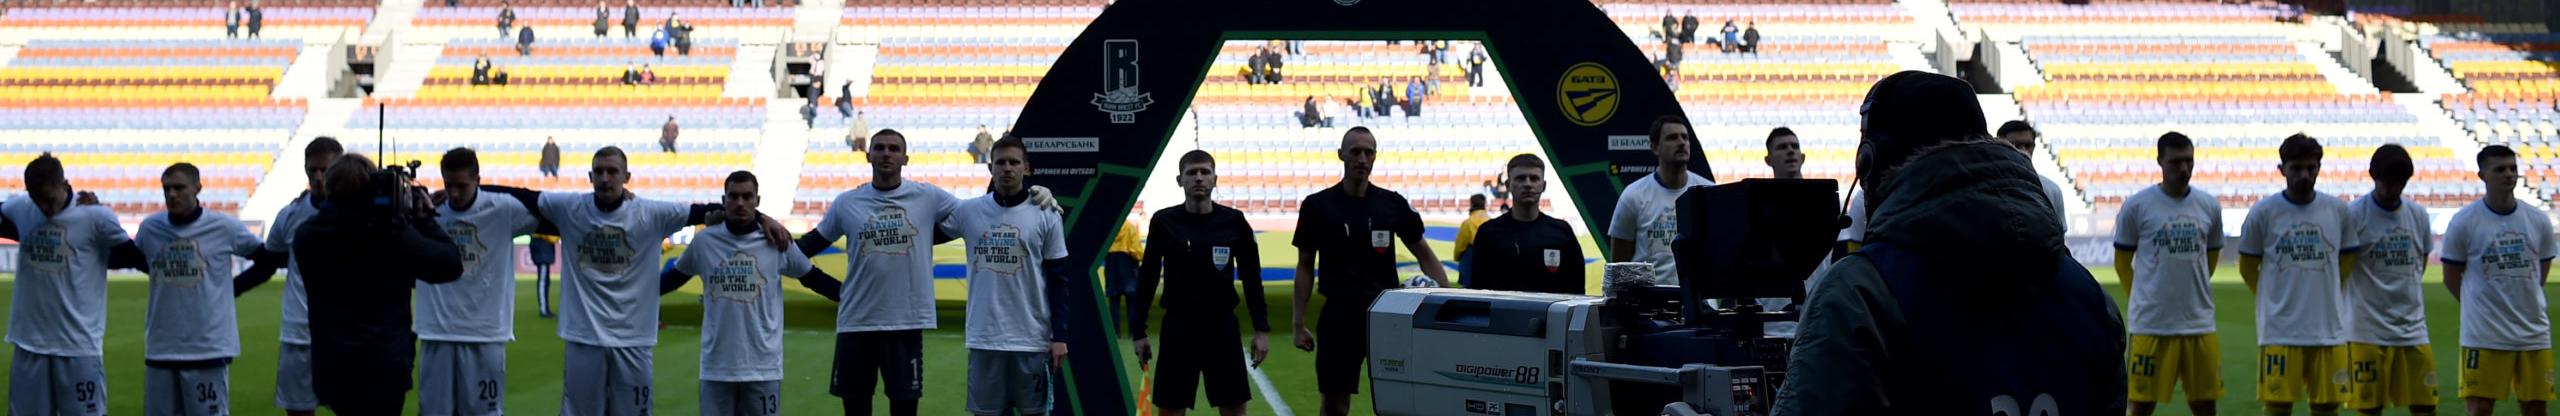 Belshina Bobruisk-Dinamo Brest, se vogliono confermarsi i campioni devono passare allo Spartak Stadium